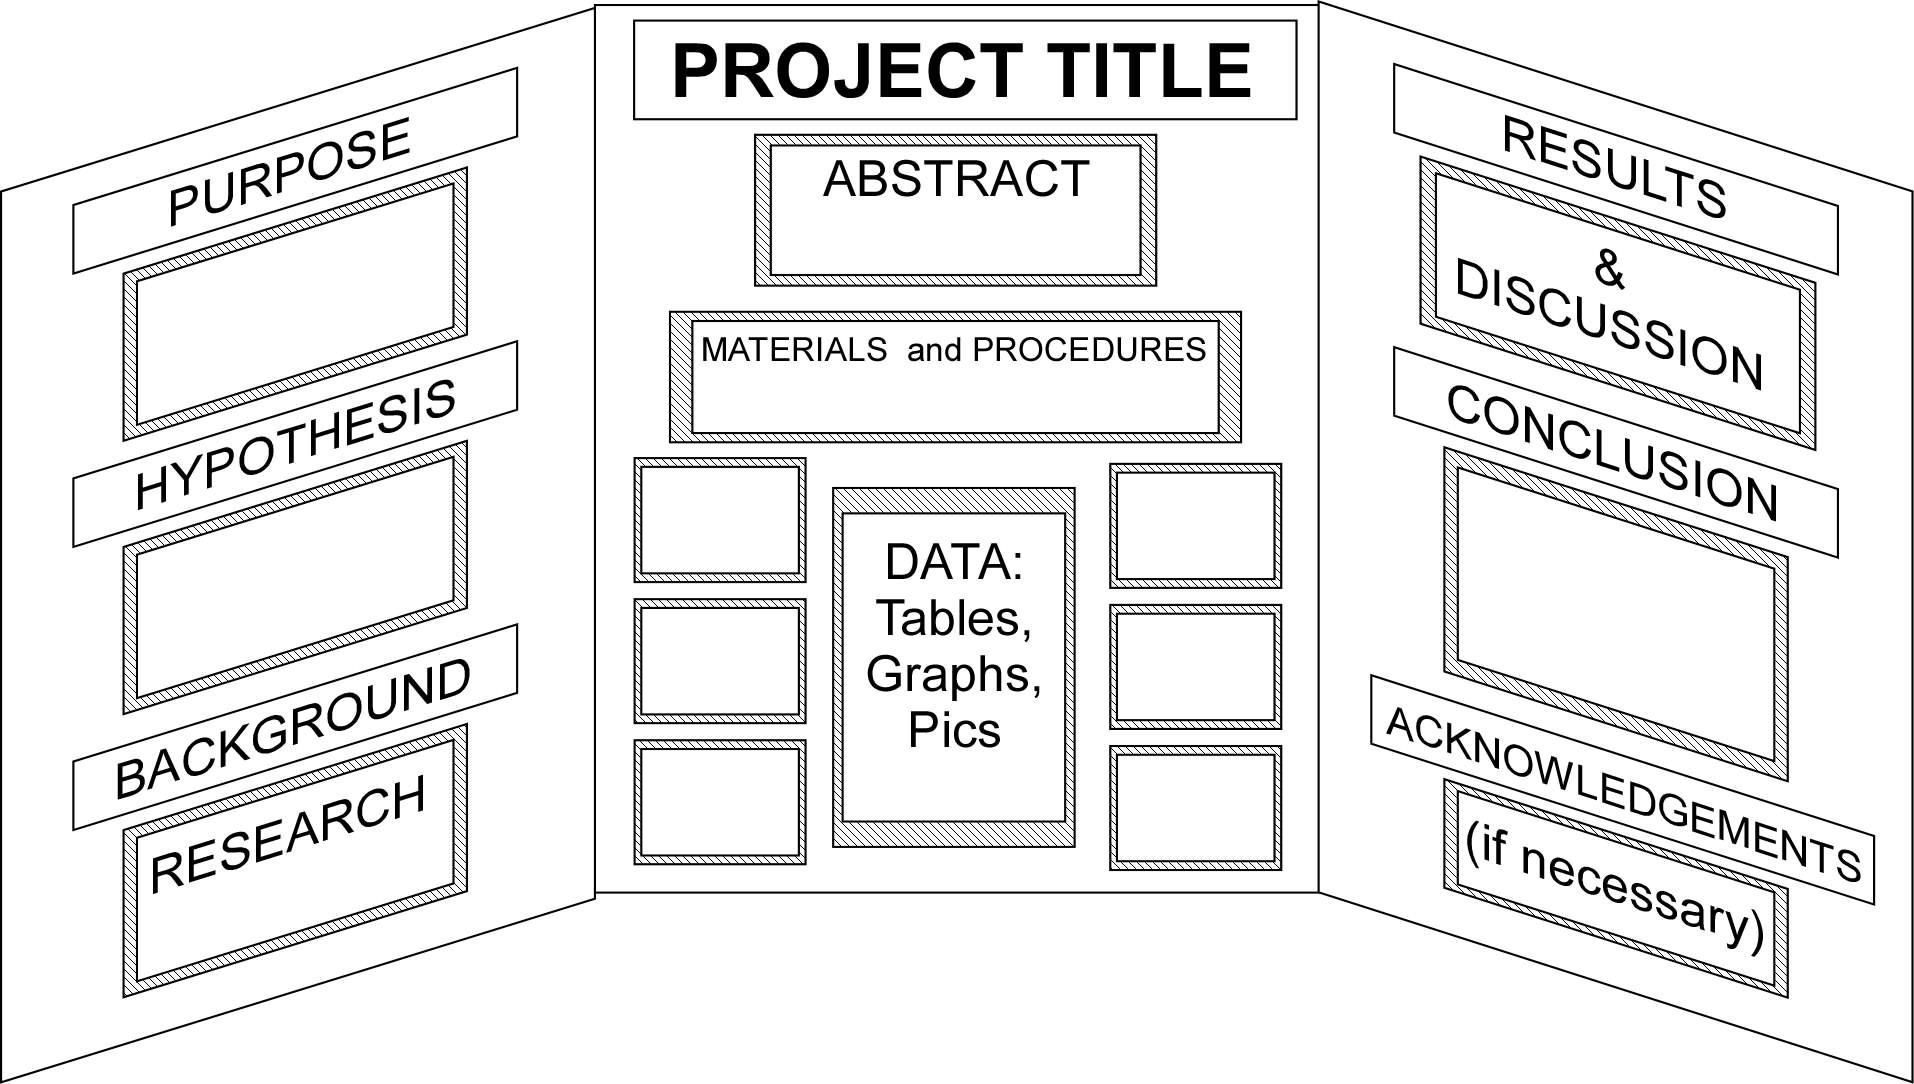 Pinsara Johnson On Science Fair Project Ideas   Science Fair - Free Printable Science Fair Project Board Labels